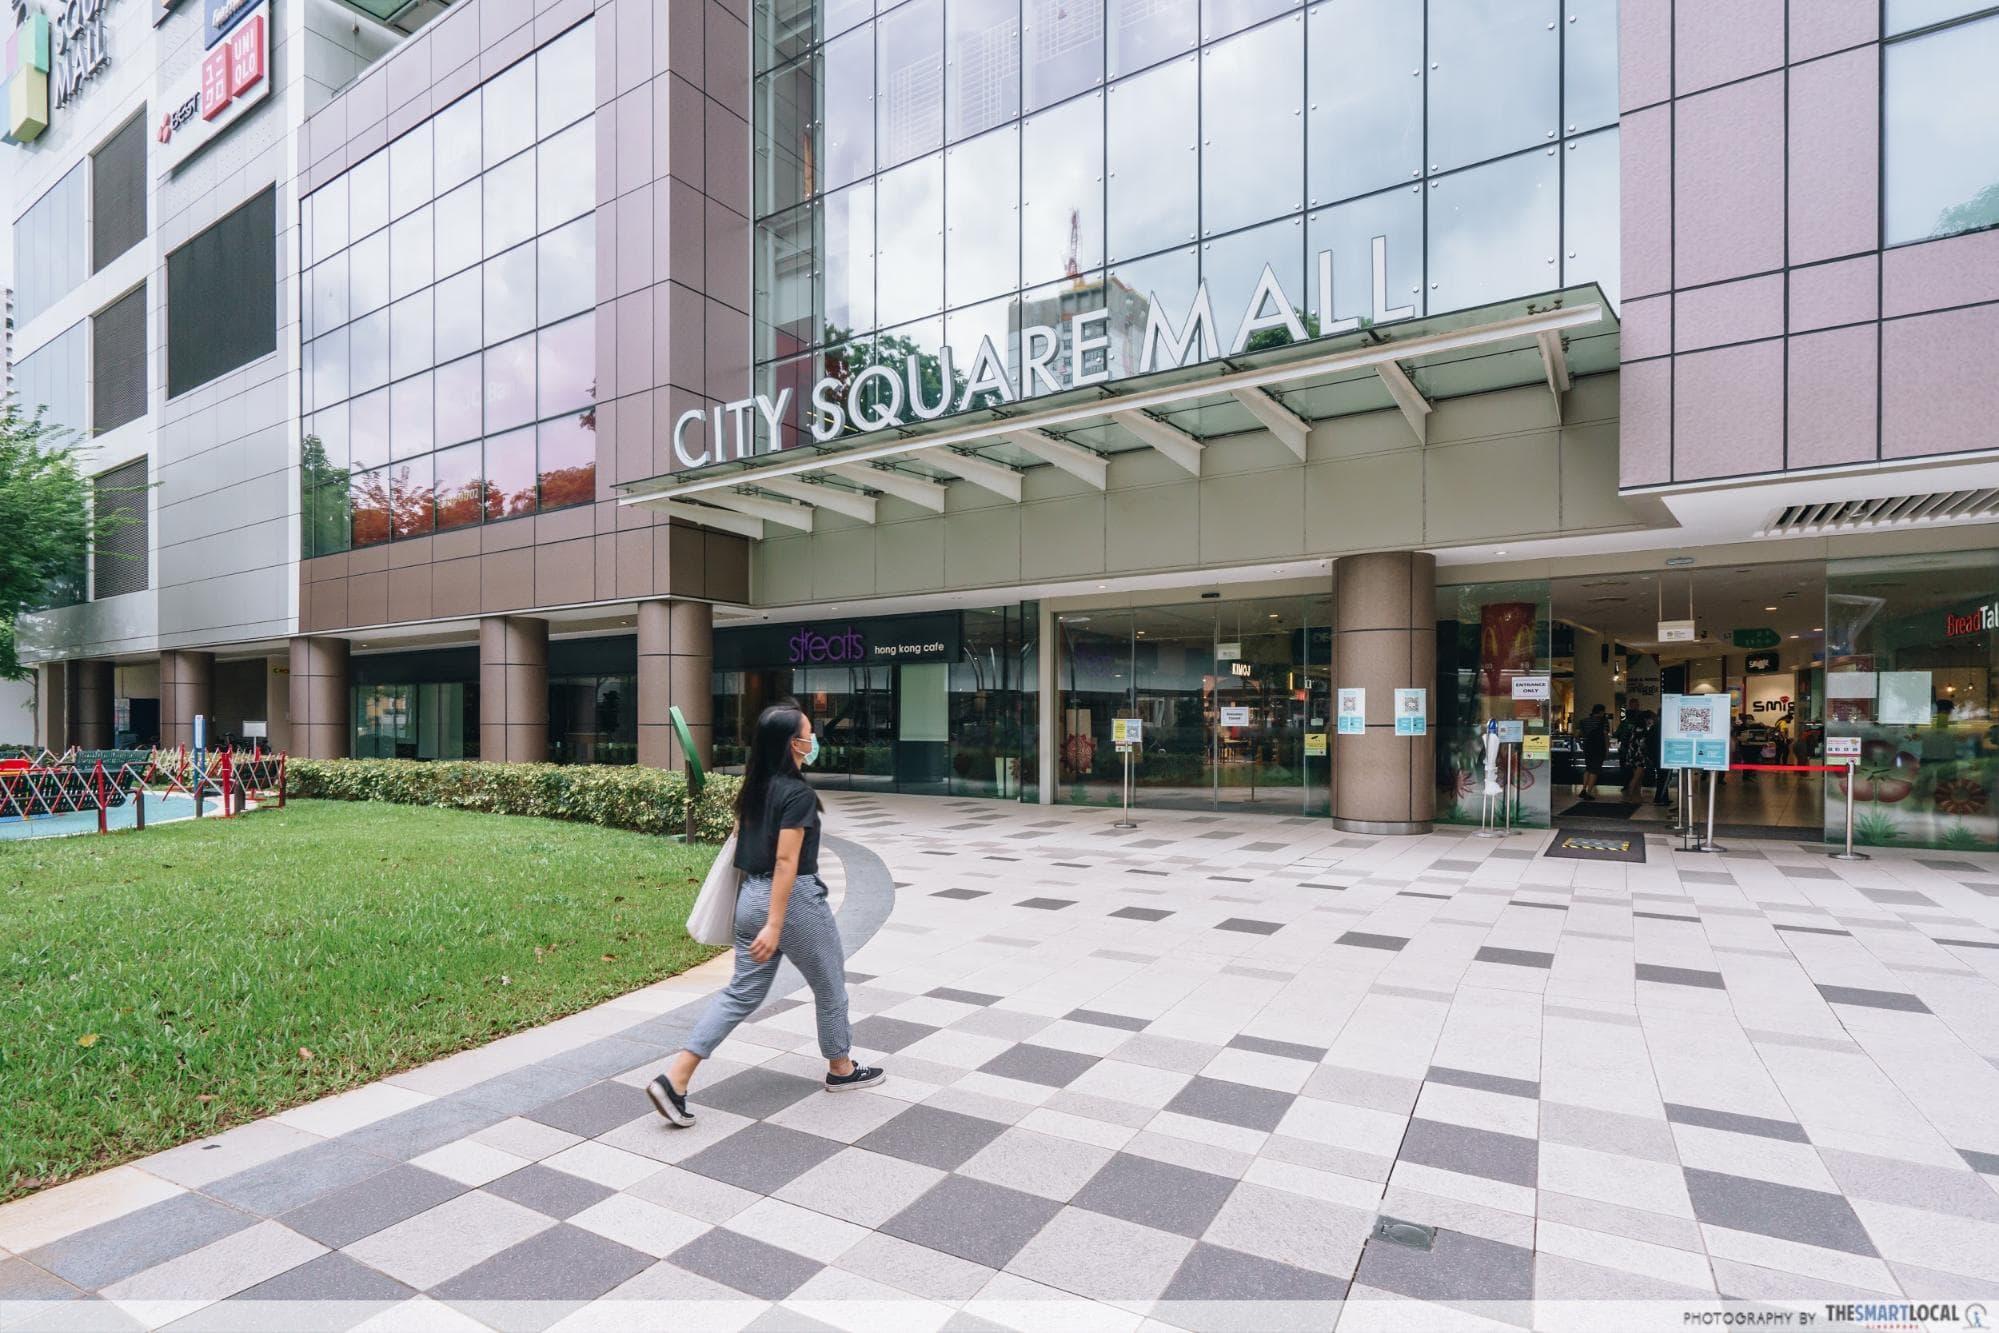 City Square Mall Singapore